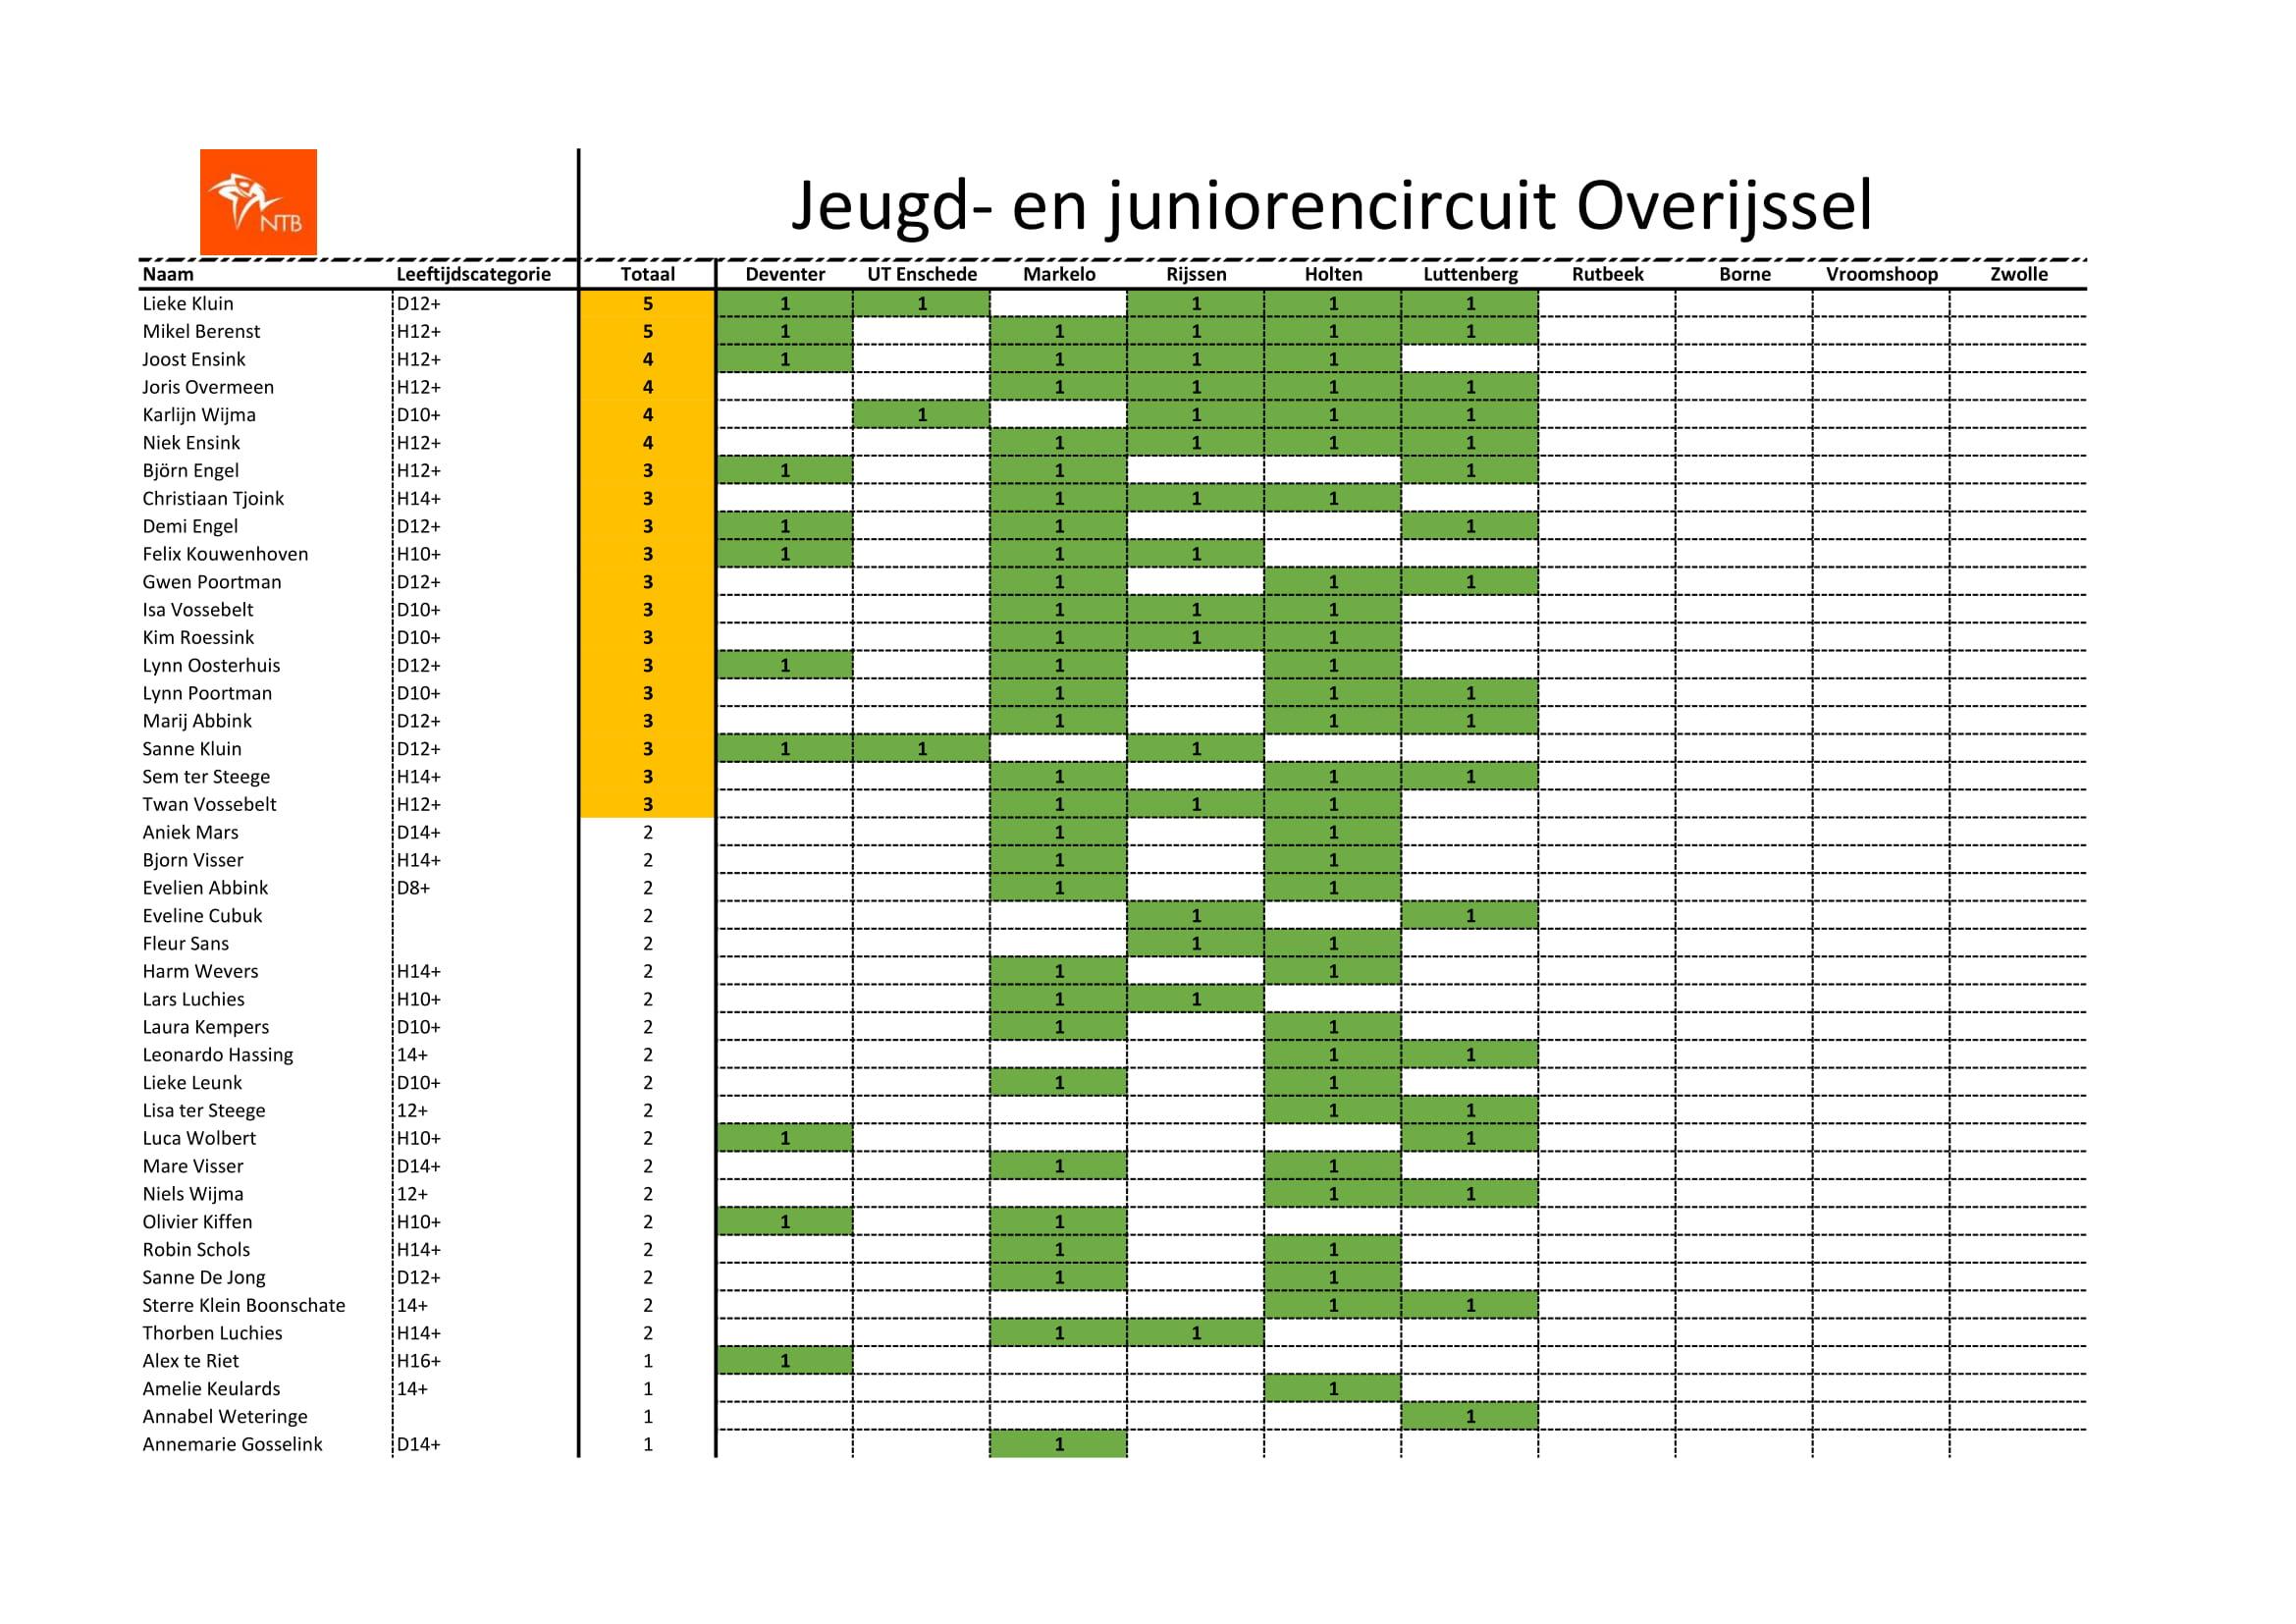 Jeugd- en juniorencircuit Overijssel - 10-7-2019-1.jpg